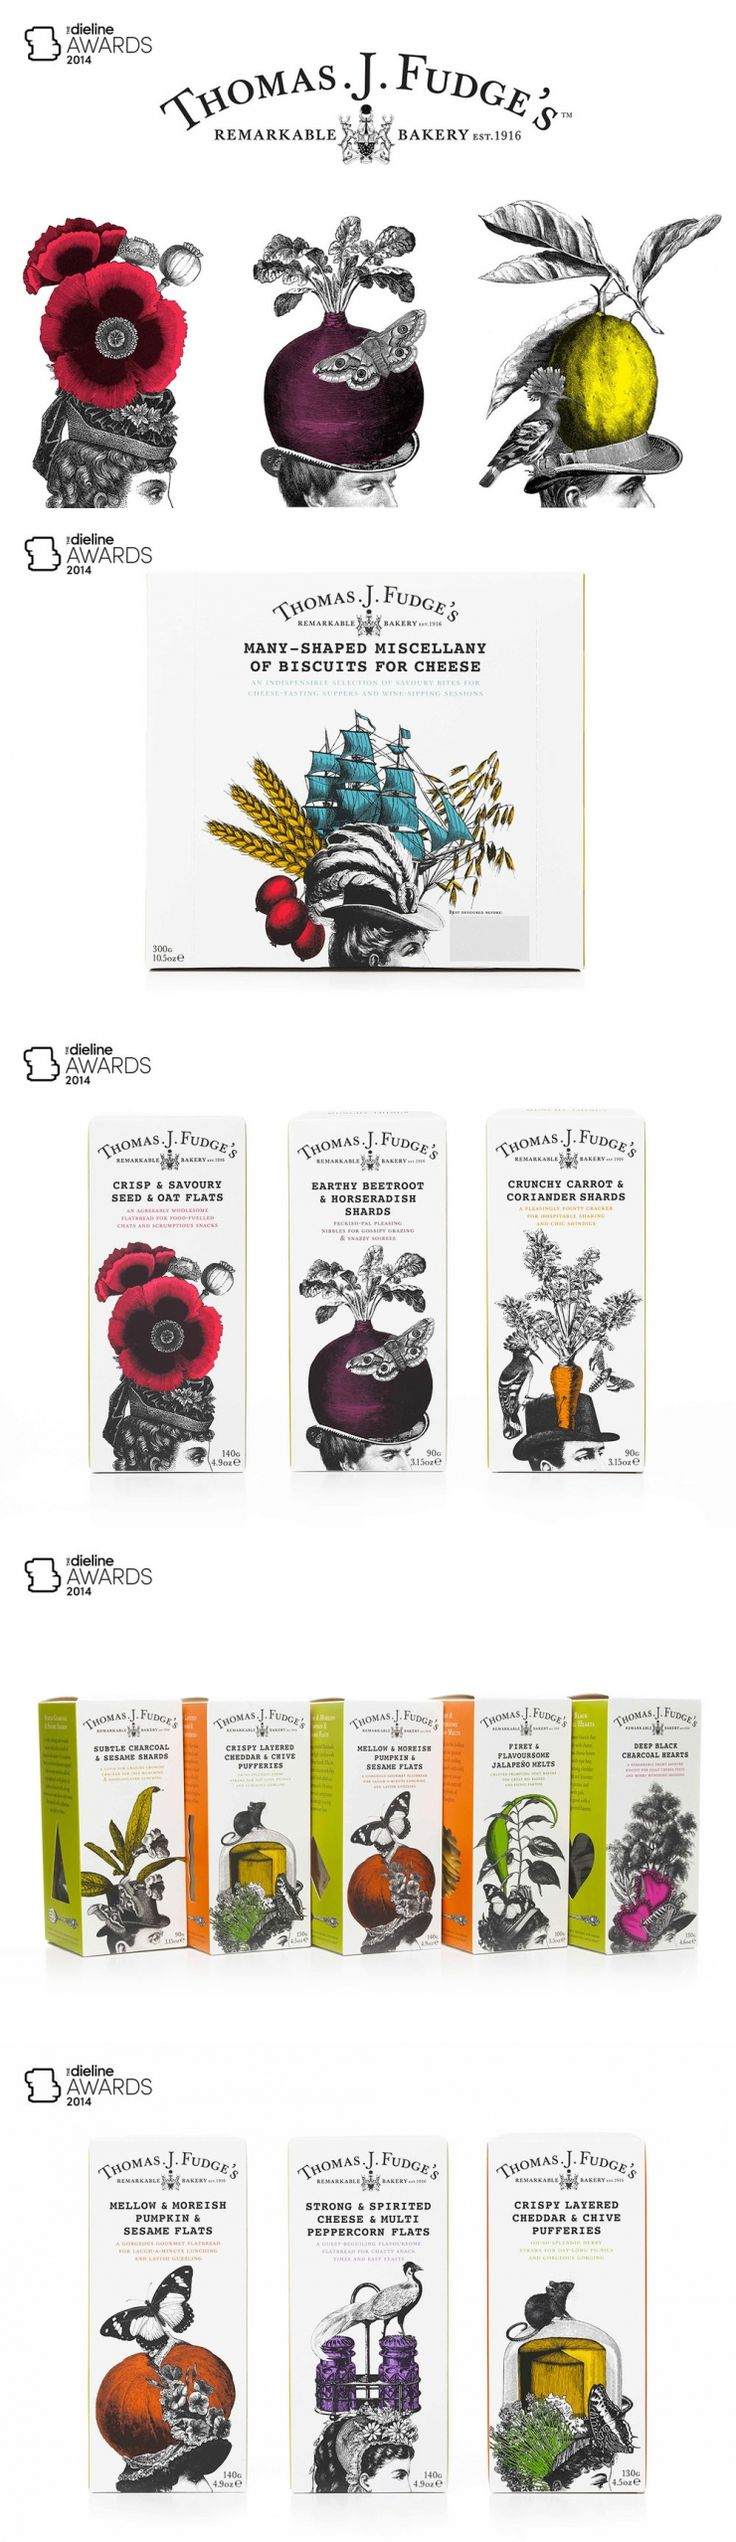 The Dieline Awards 2014: Prepared Food, 3rd Place – Thomas J Fudge — The Dieline   Packaging & Branding Design & Innovation News